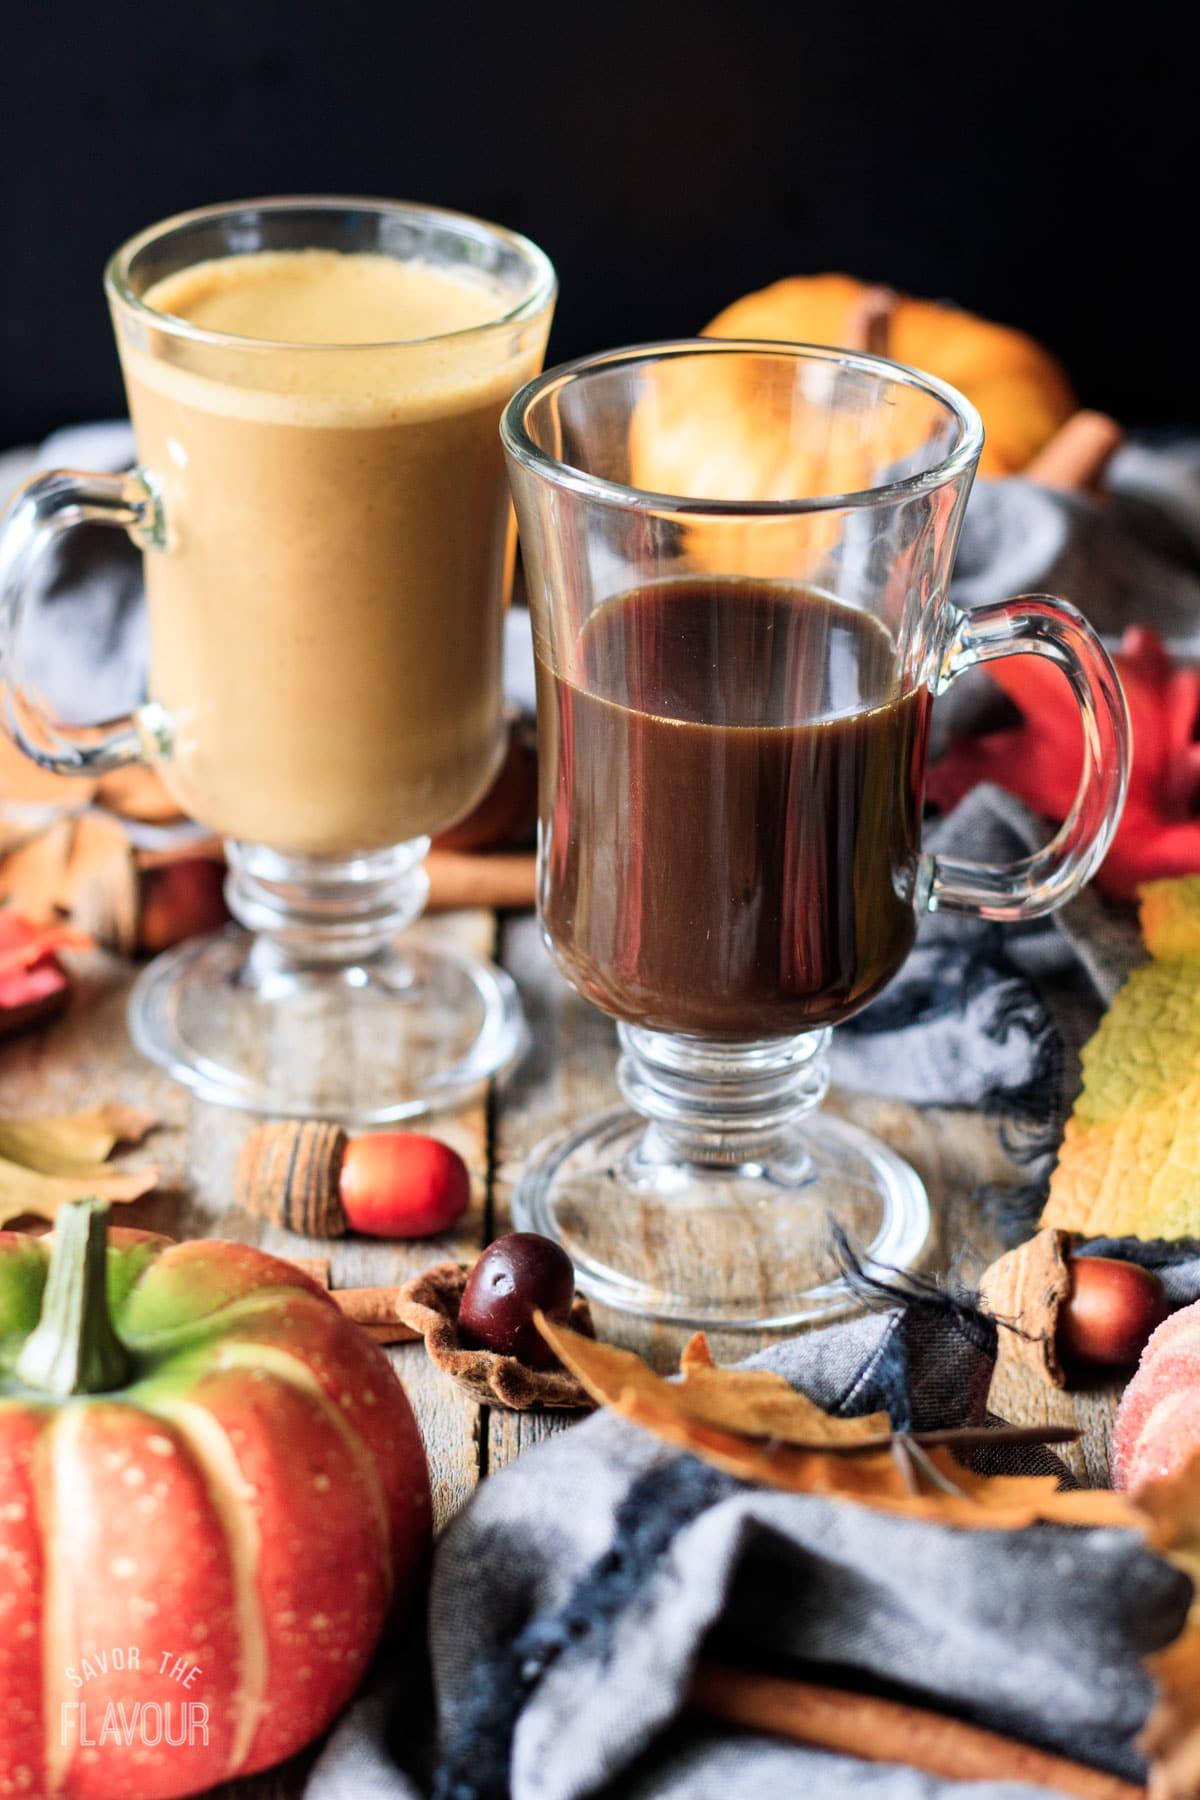 espresso in a glass mug